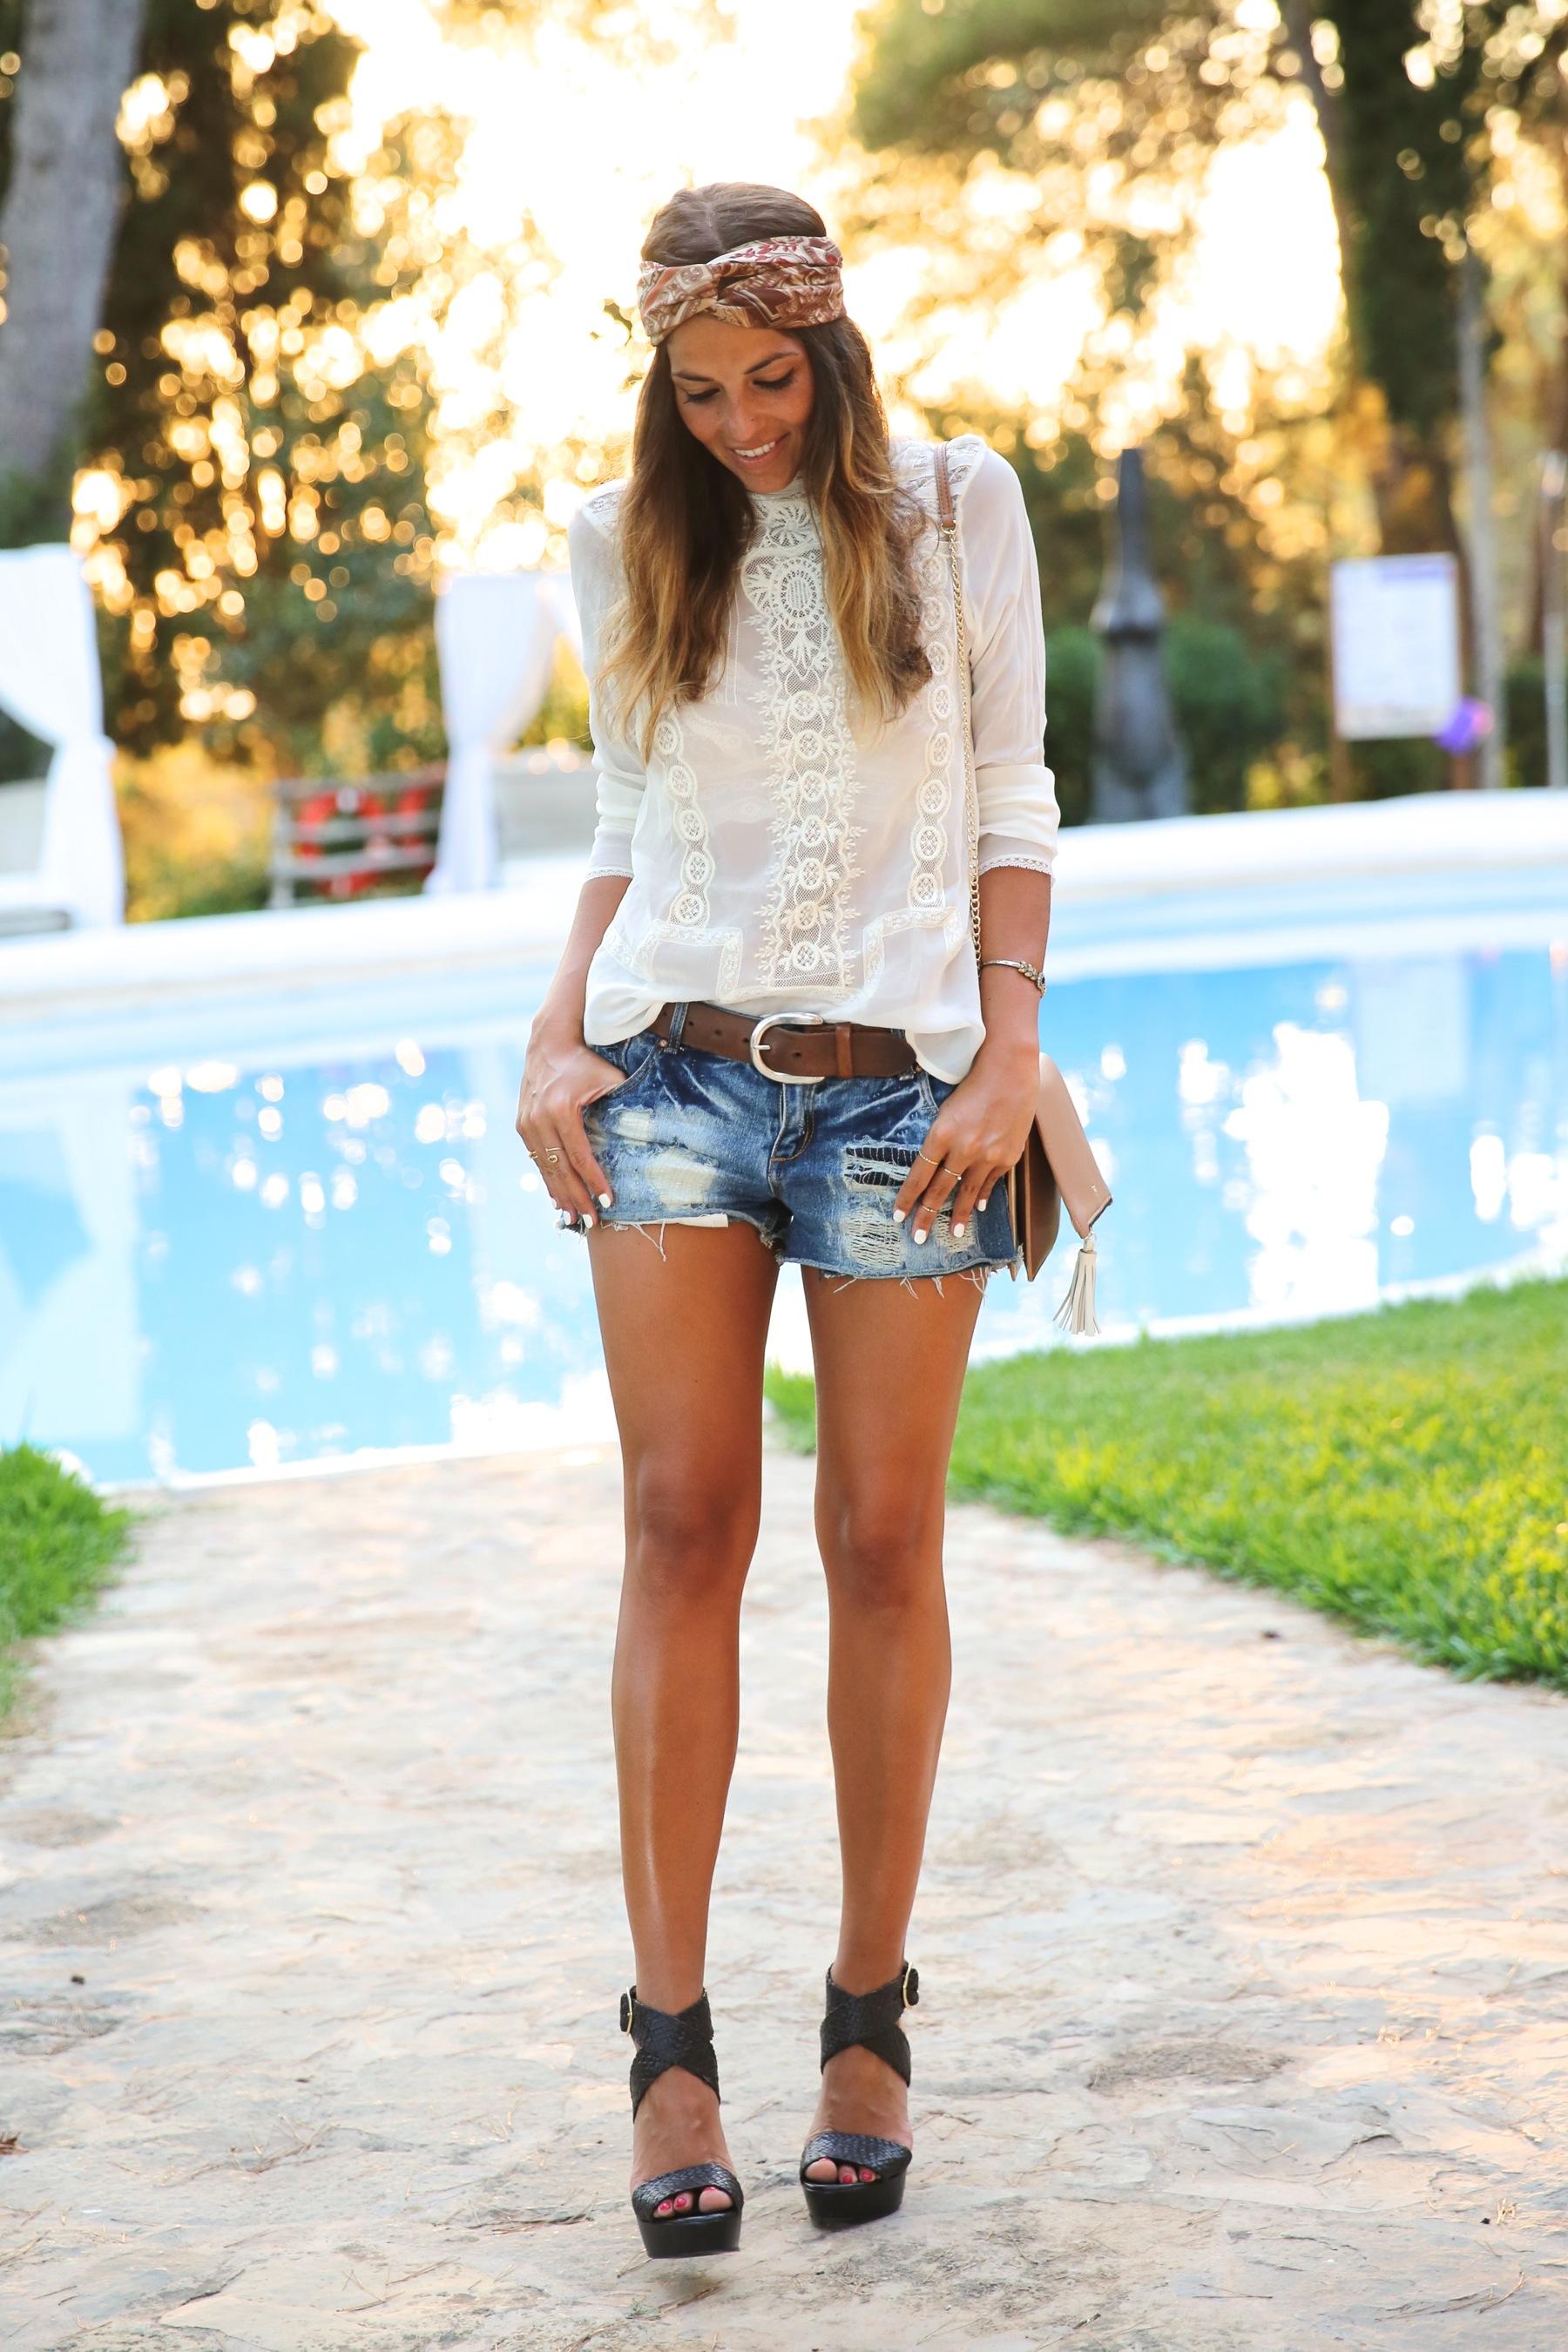 trendy_taste-look-outfit-street_style-ootd-blog-blogger-fashion_spain-moda_españa-boho-hippie-denim_shorts-shorts_vaqueros-blusa-blouse-mas34-pg-ibiza-sa_talaia-13